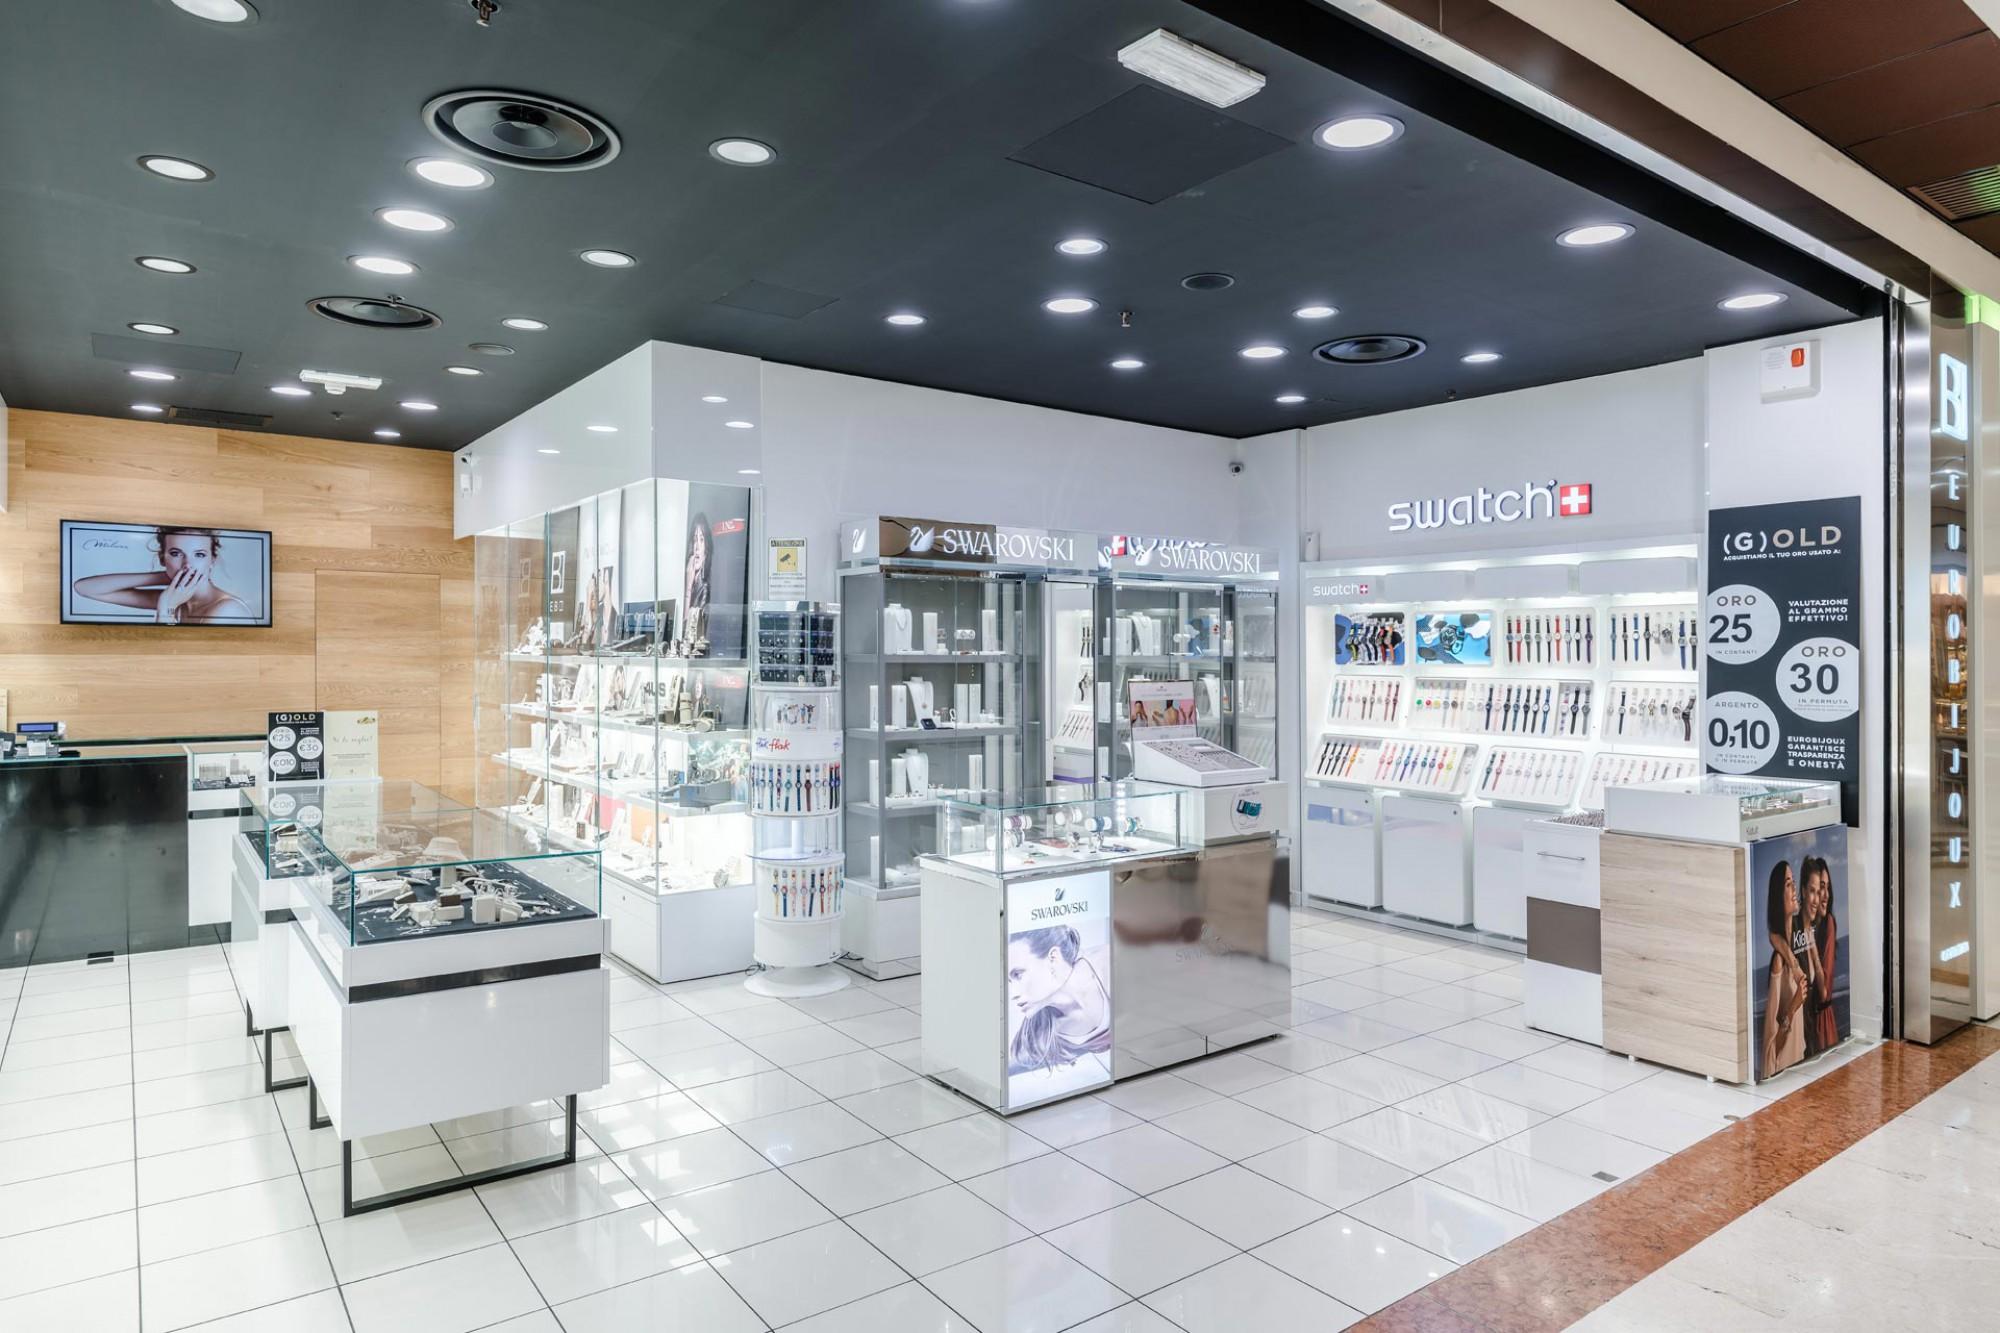 eurobijoux gioielleria novate milanese centro commerciale metropoli